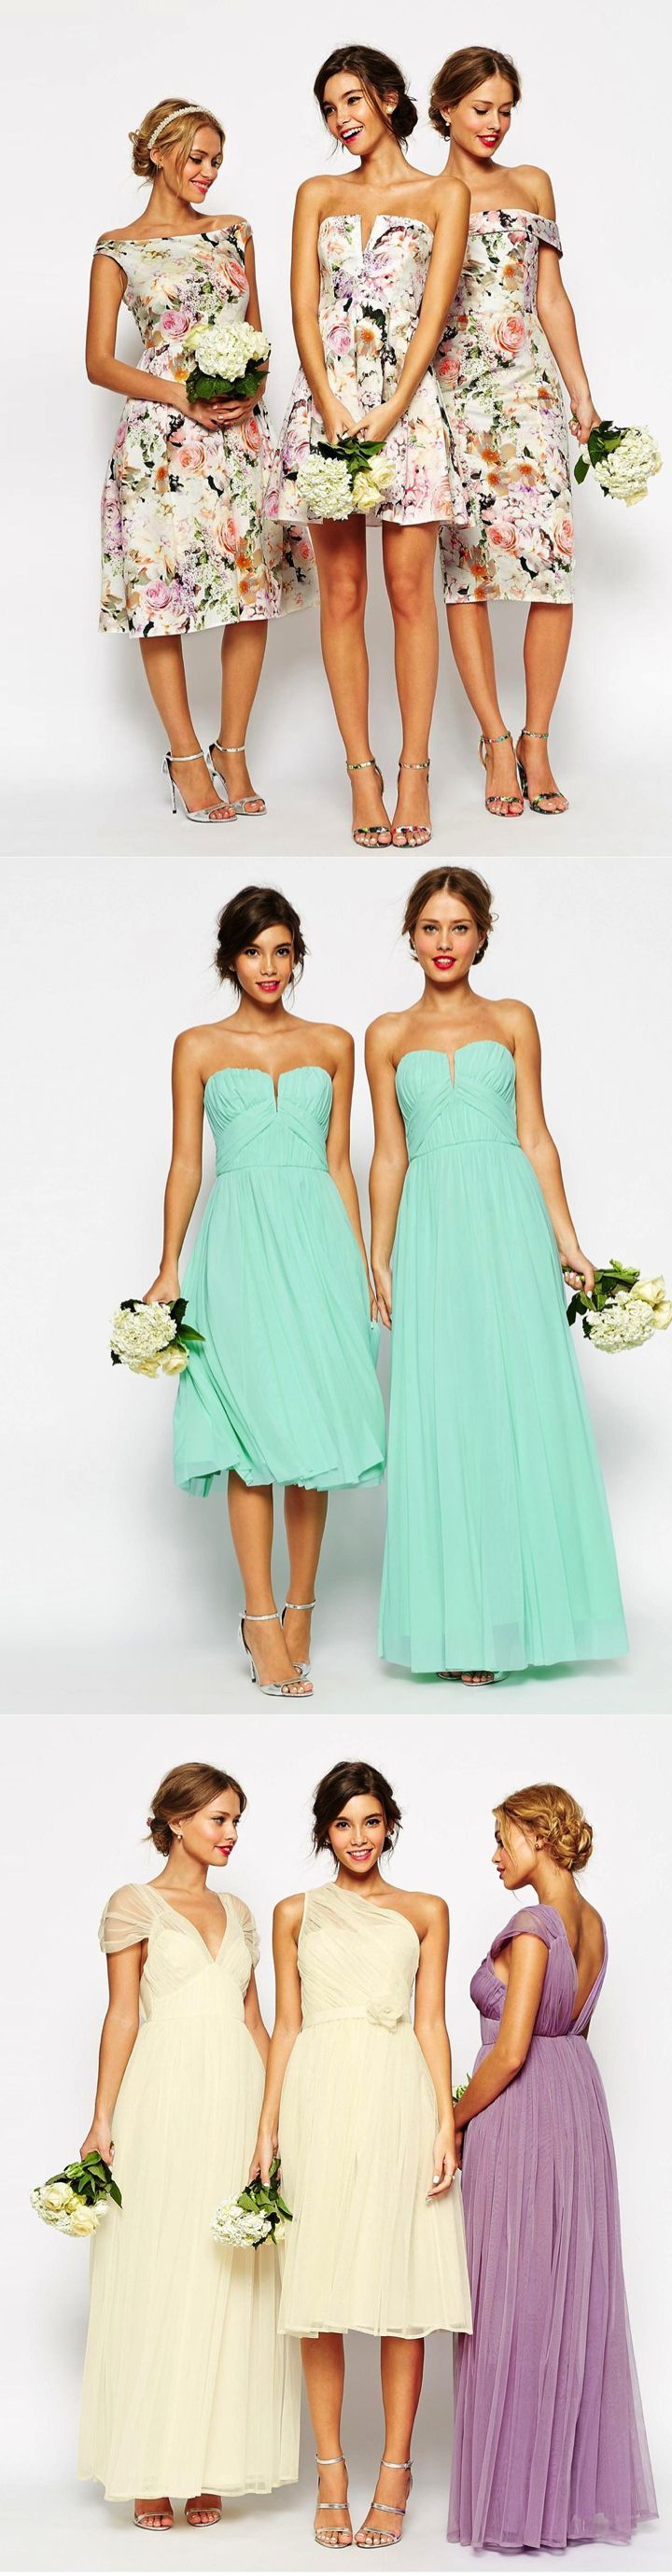 best bridesmaids images on pinterest